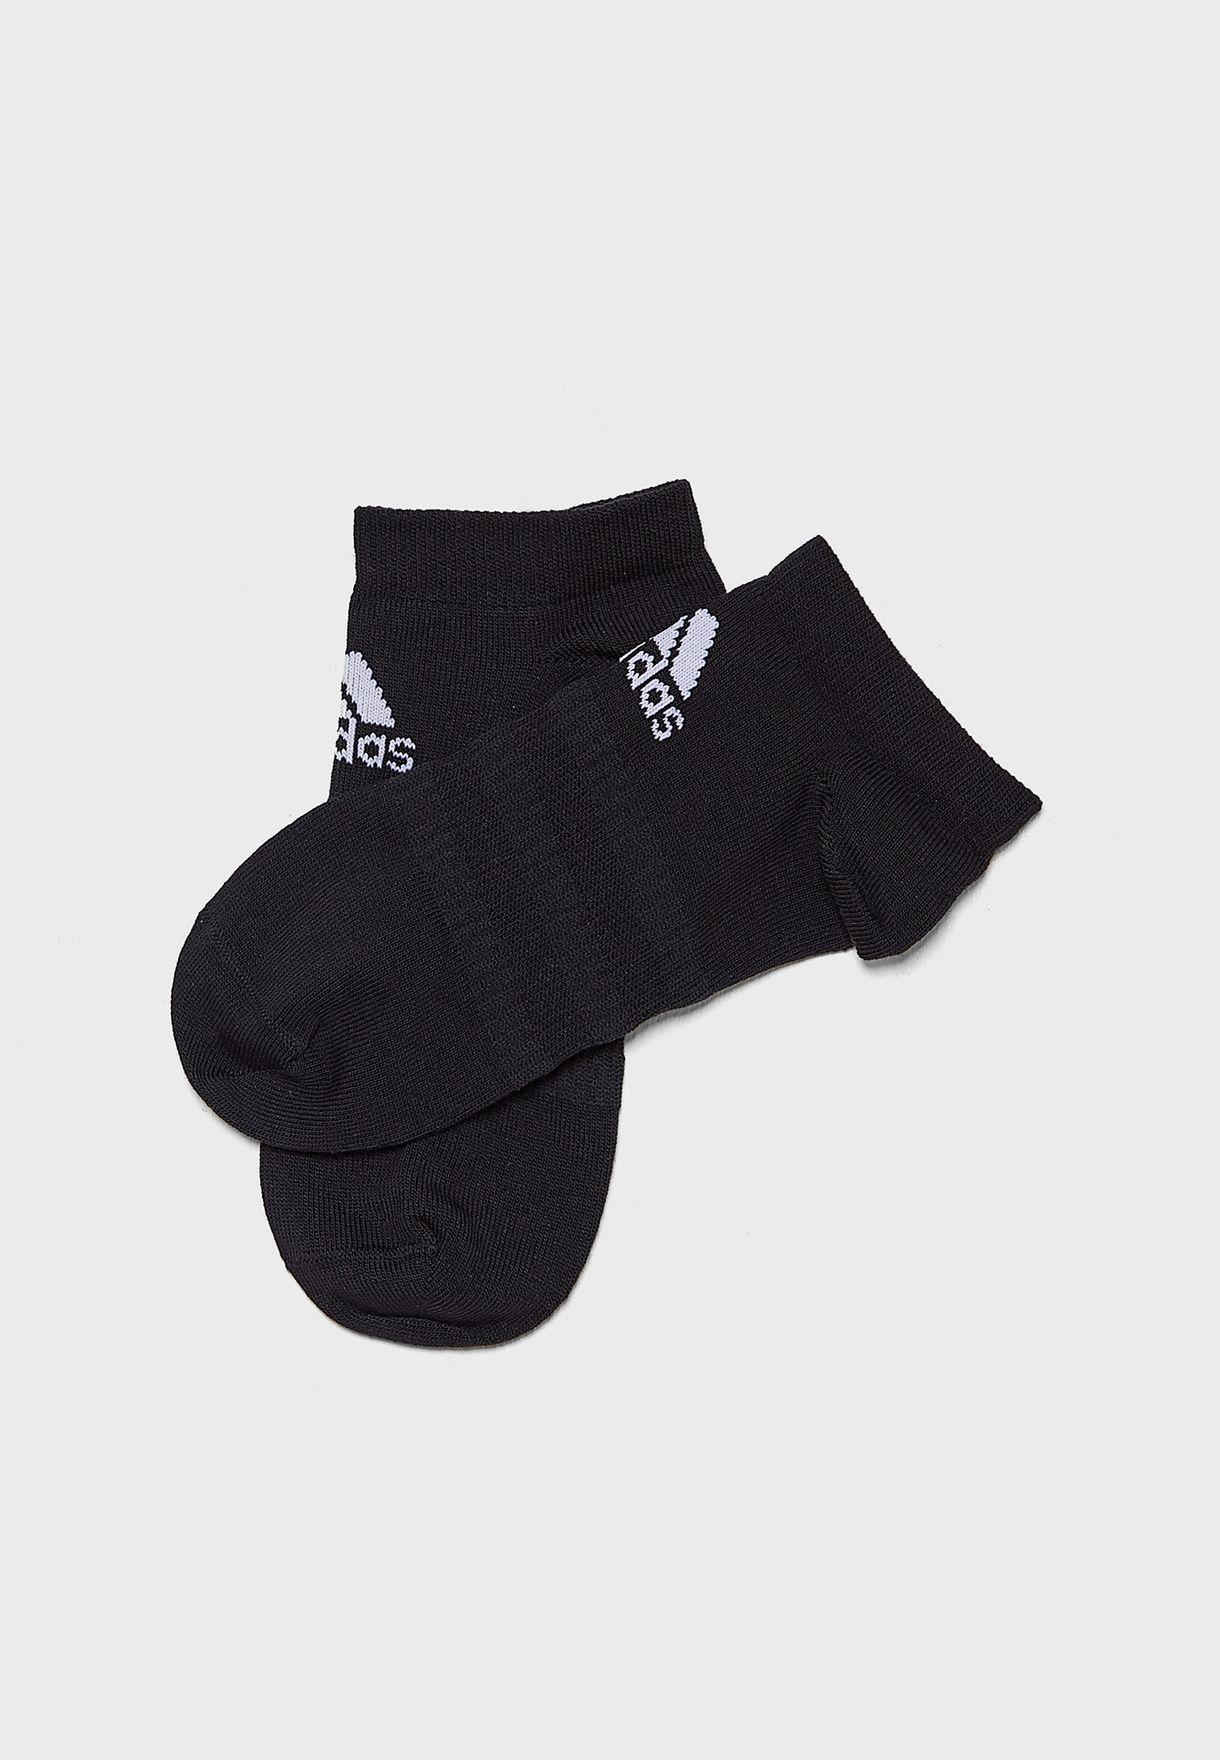 3 Pack Light Essentials Sports Training UnisexNo Show Socks